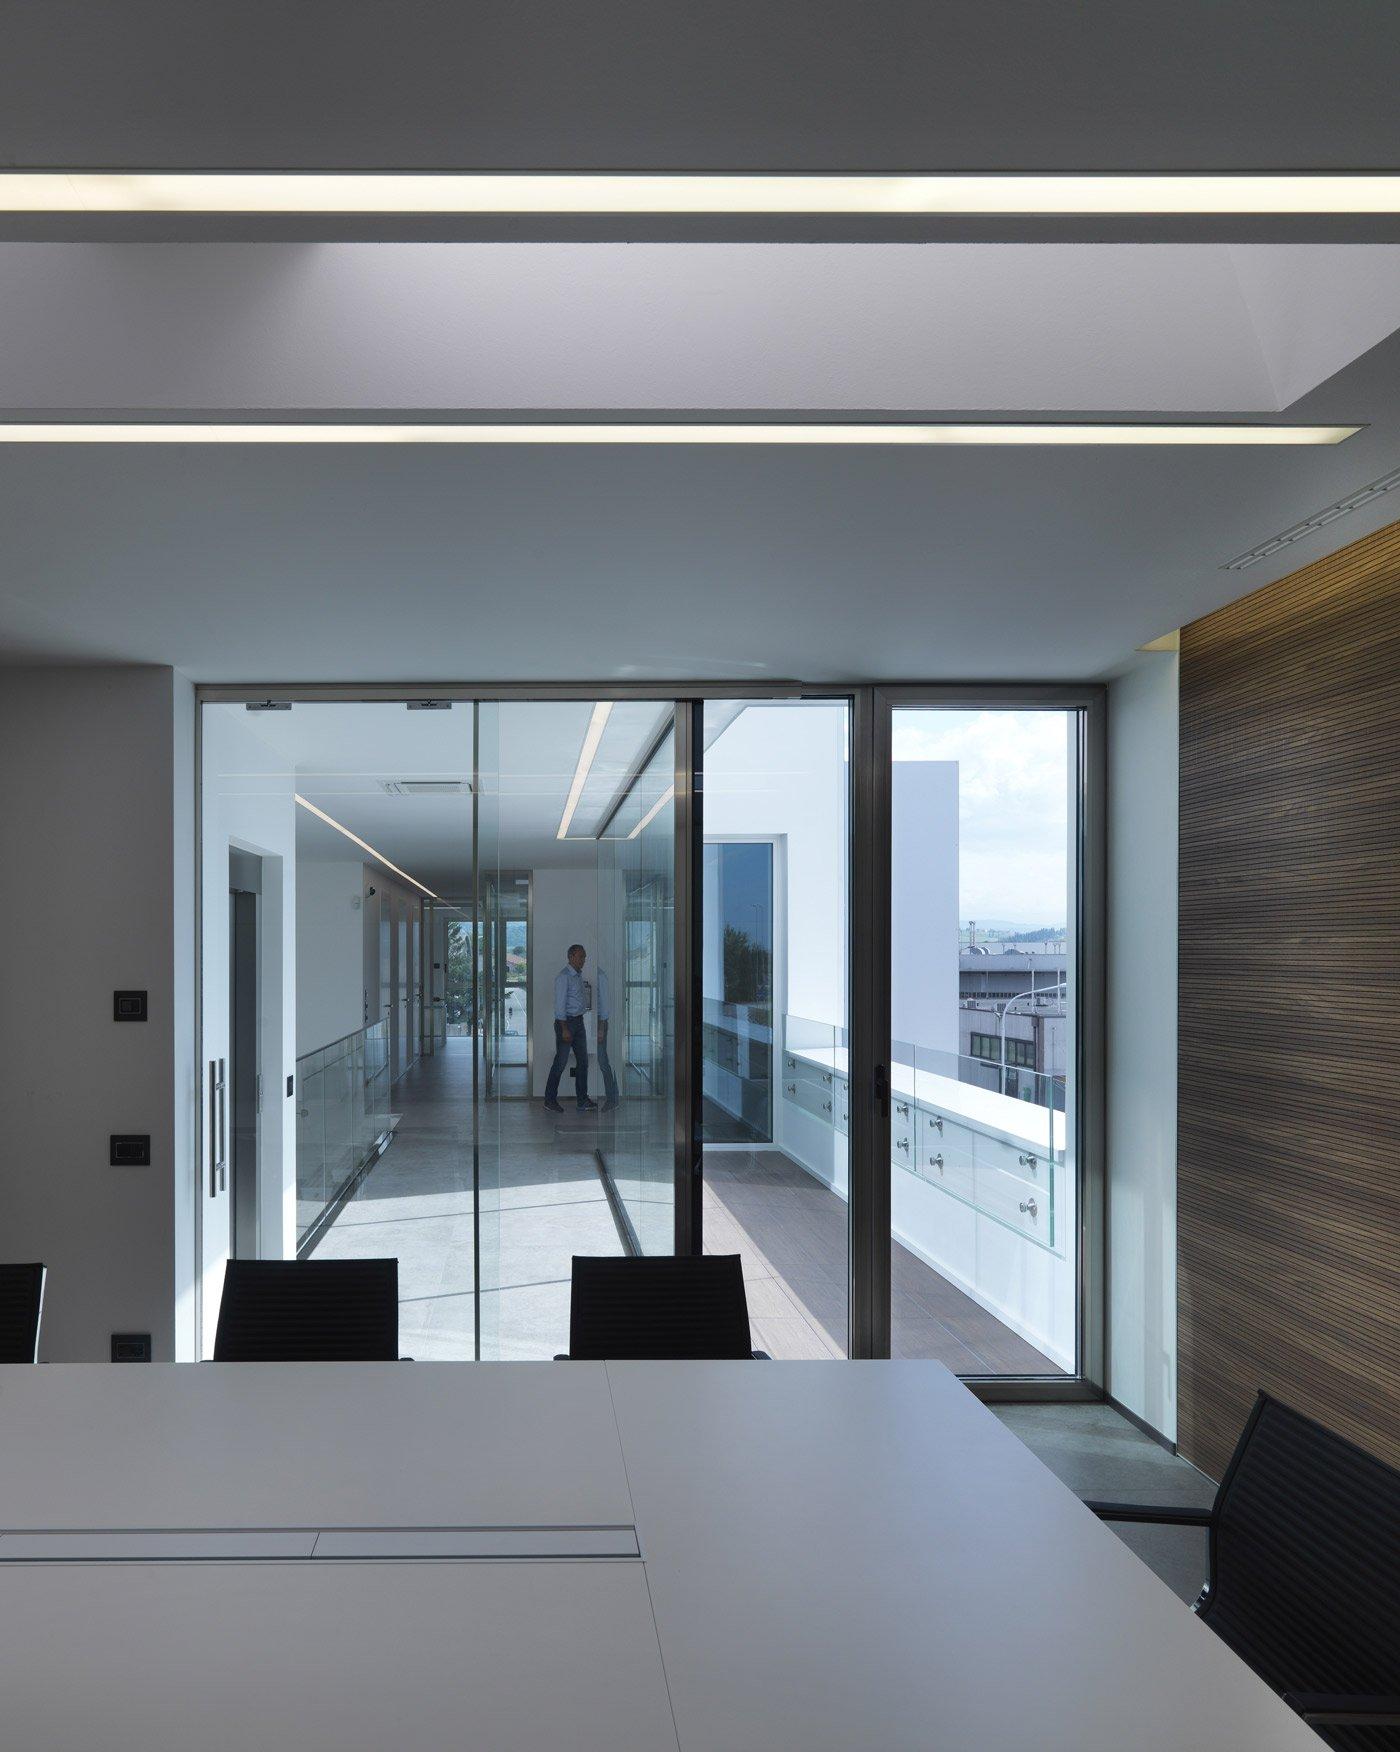 mimik 20 by prisma architectural. Black Bedroom Furniture Sets. Home Design Ideas